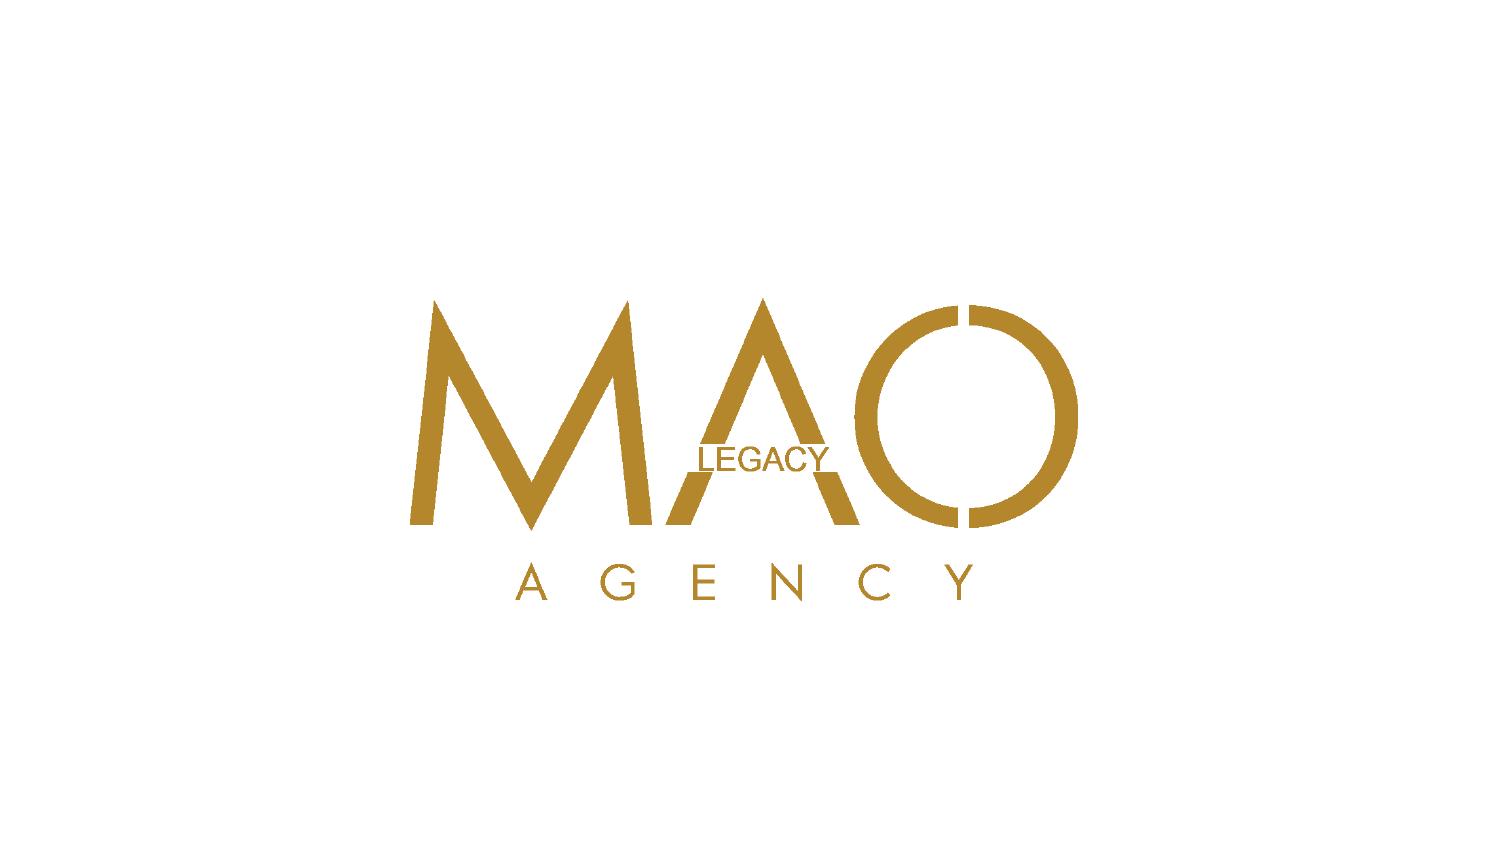 Mao Legacy